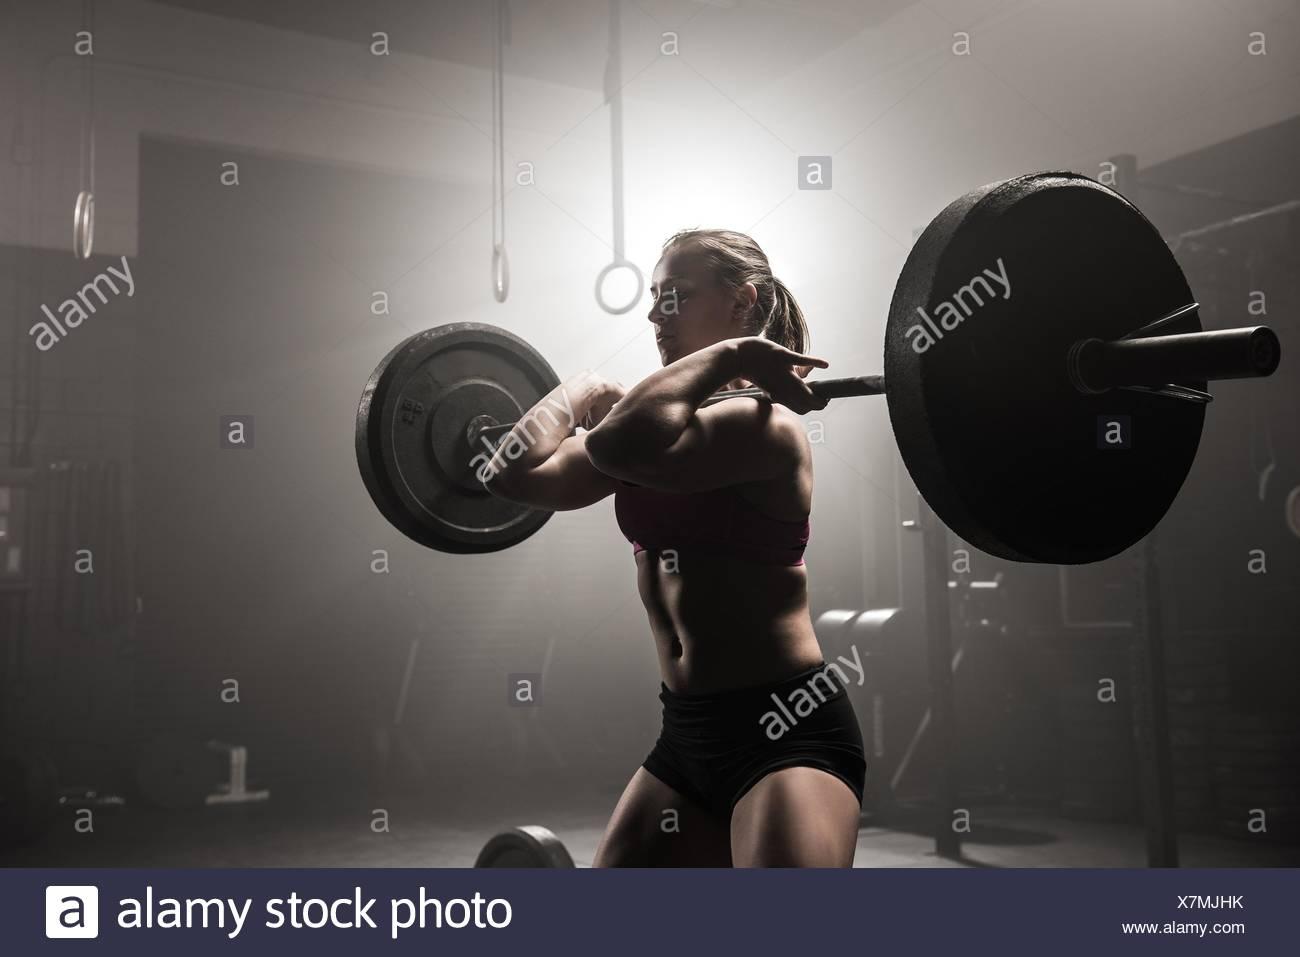 Young woman lifting barbell - Stock Image